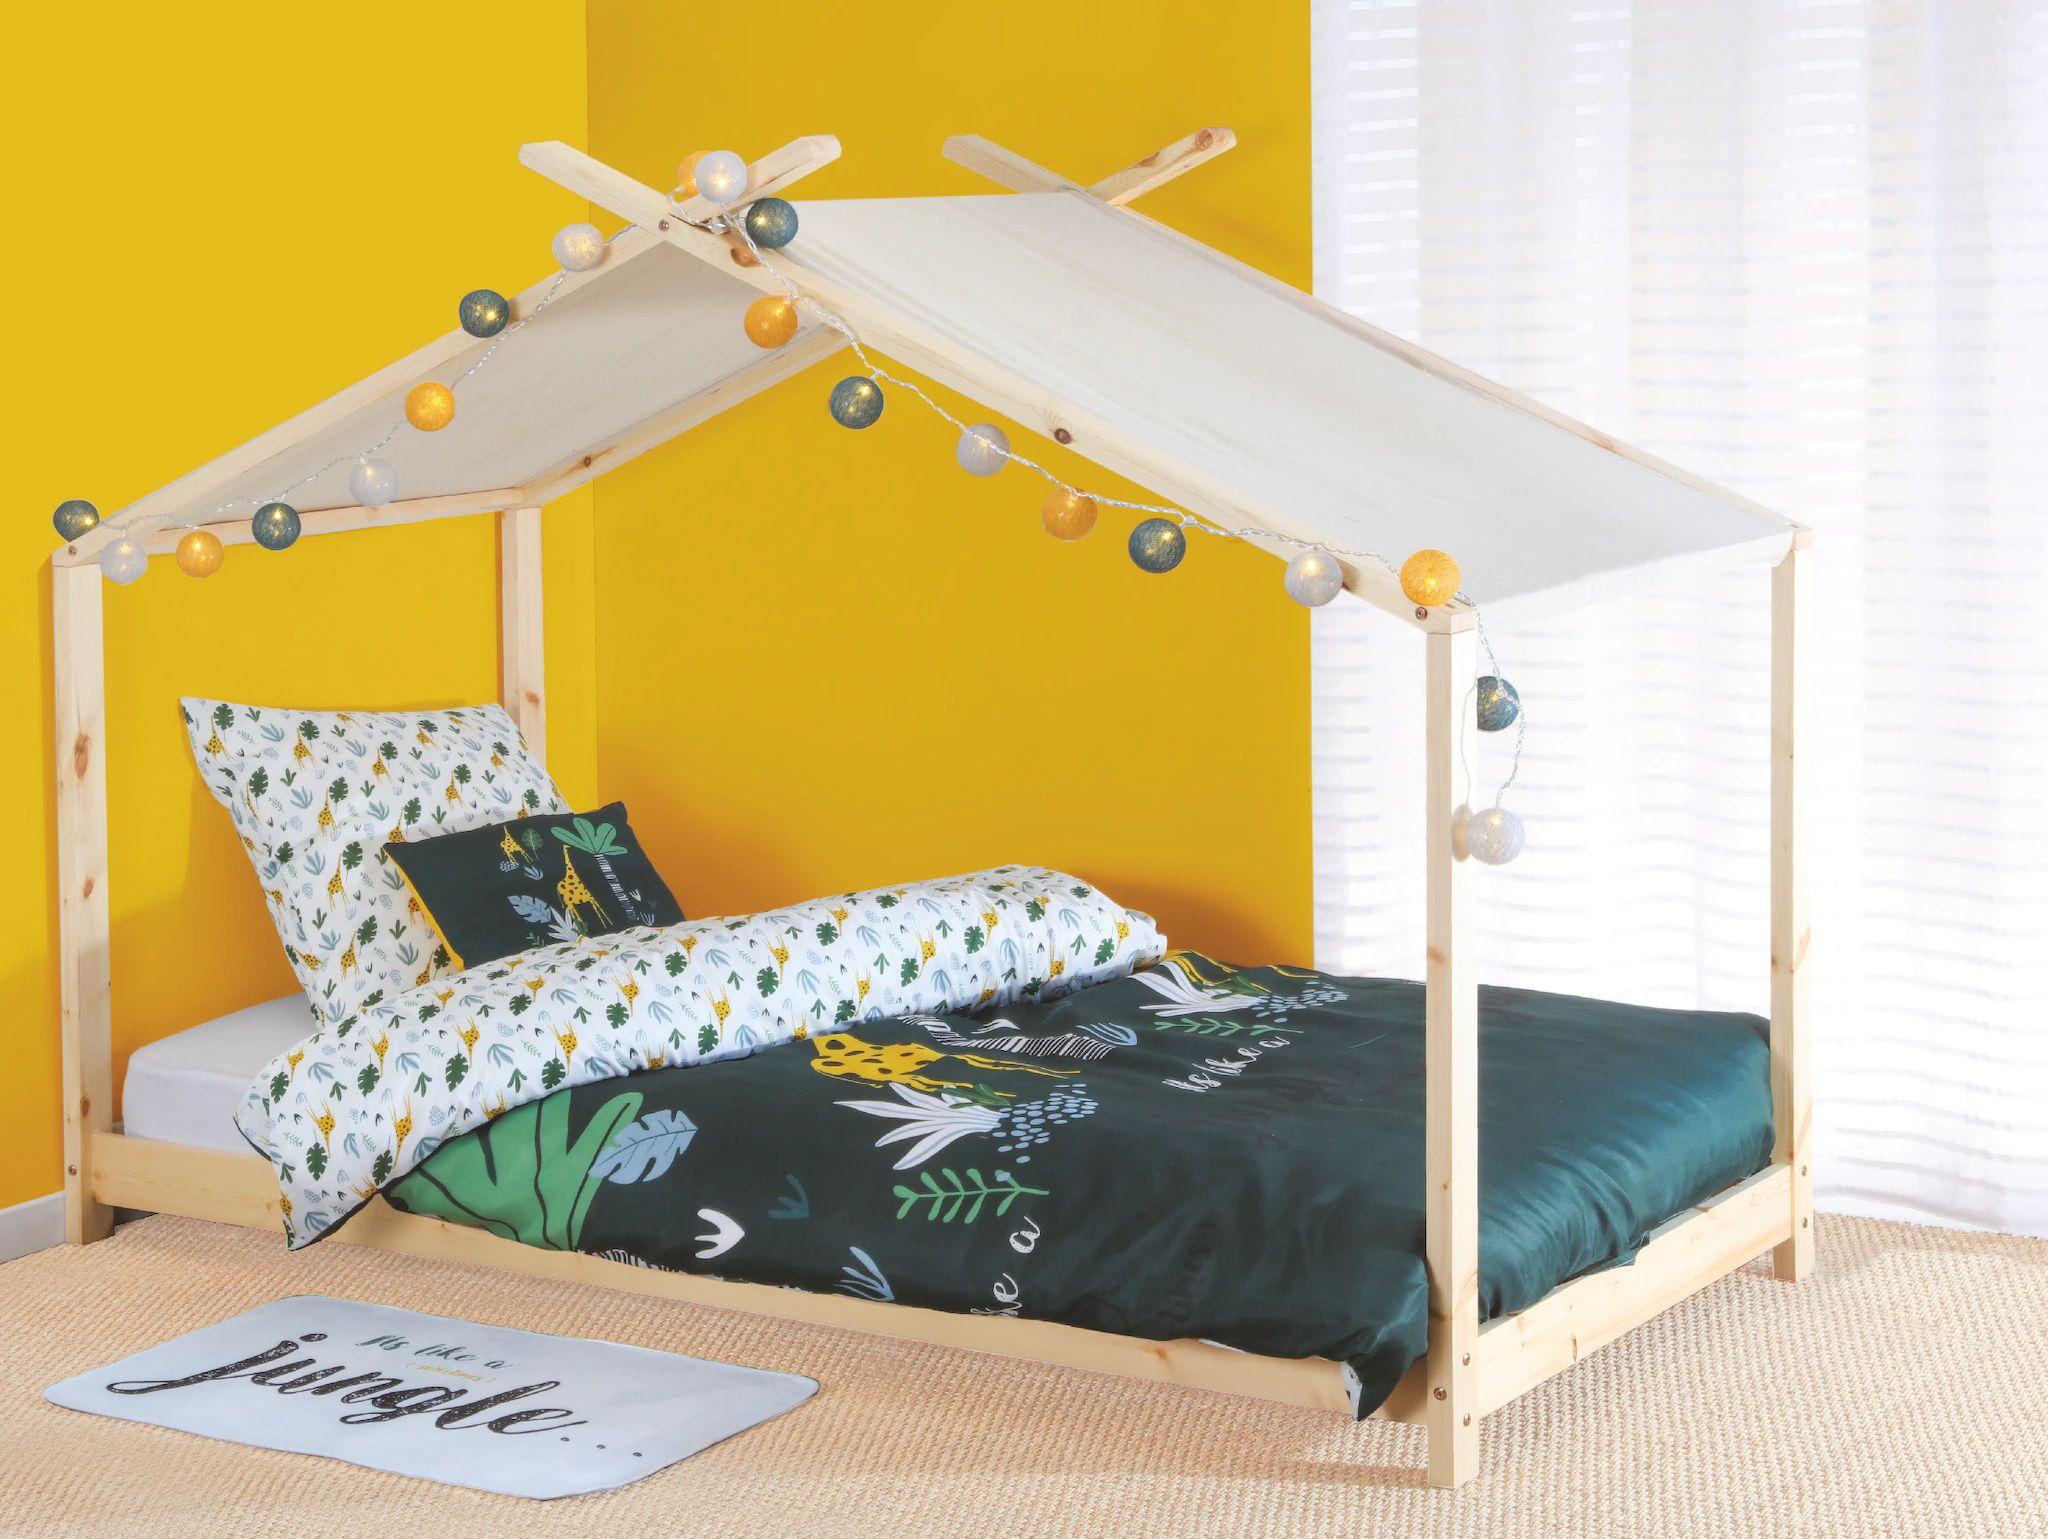 Lit cabane Atmosphera en pin avec sommier 90x190cm + toile de cabane offerte